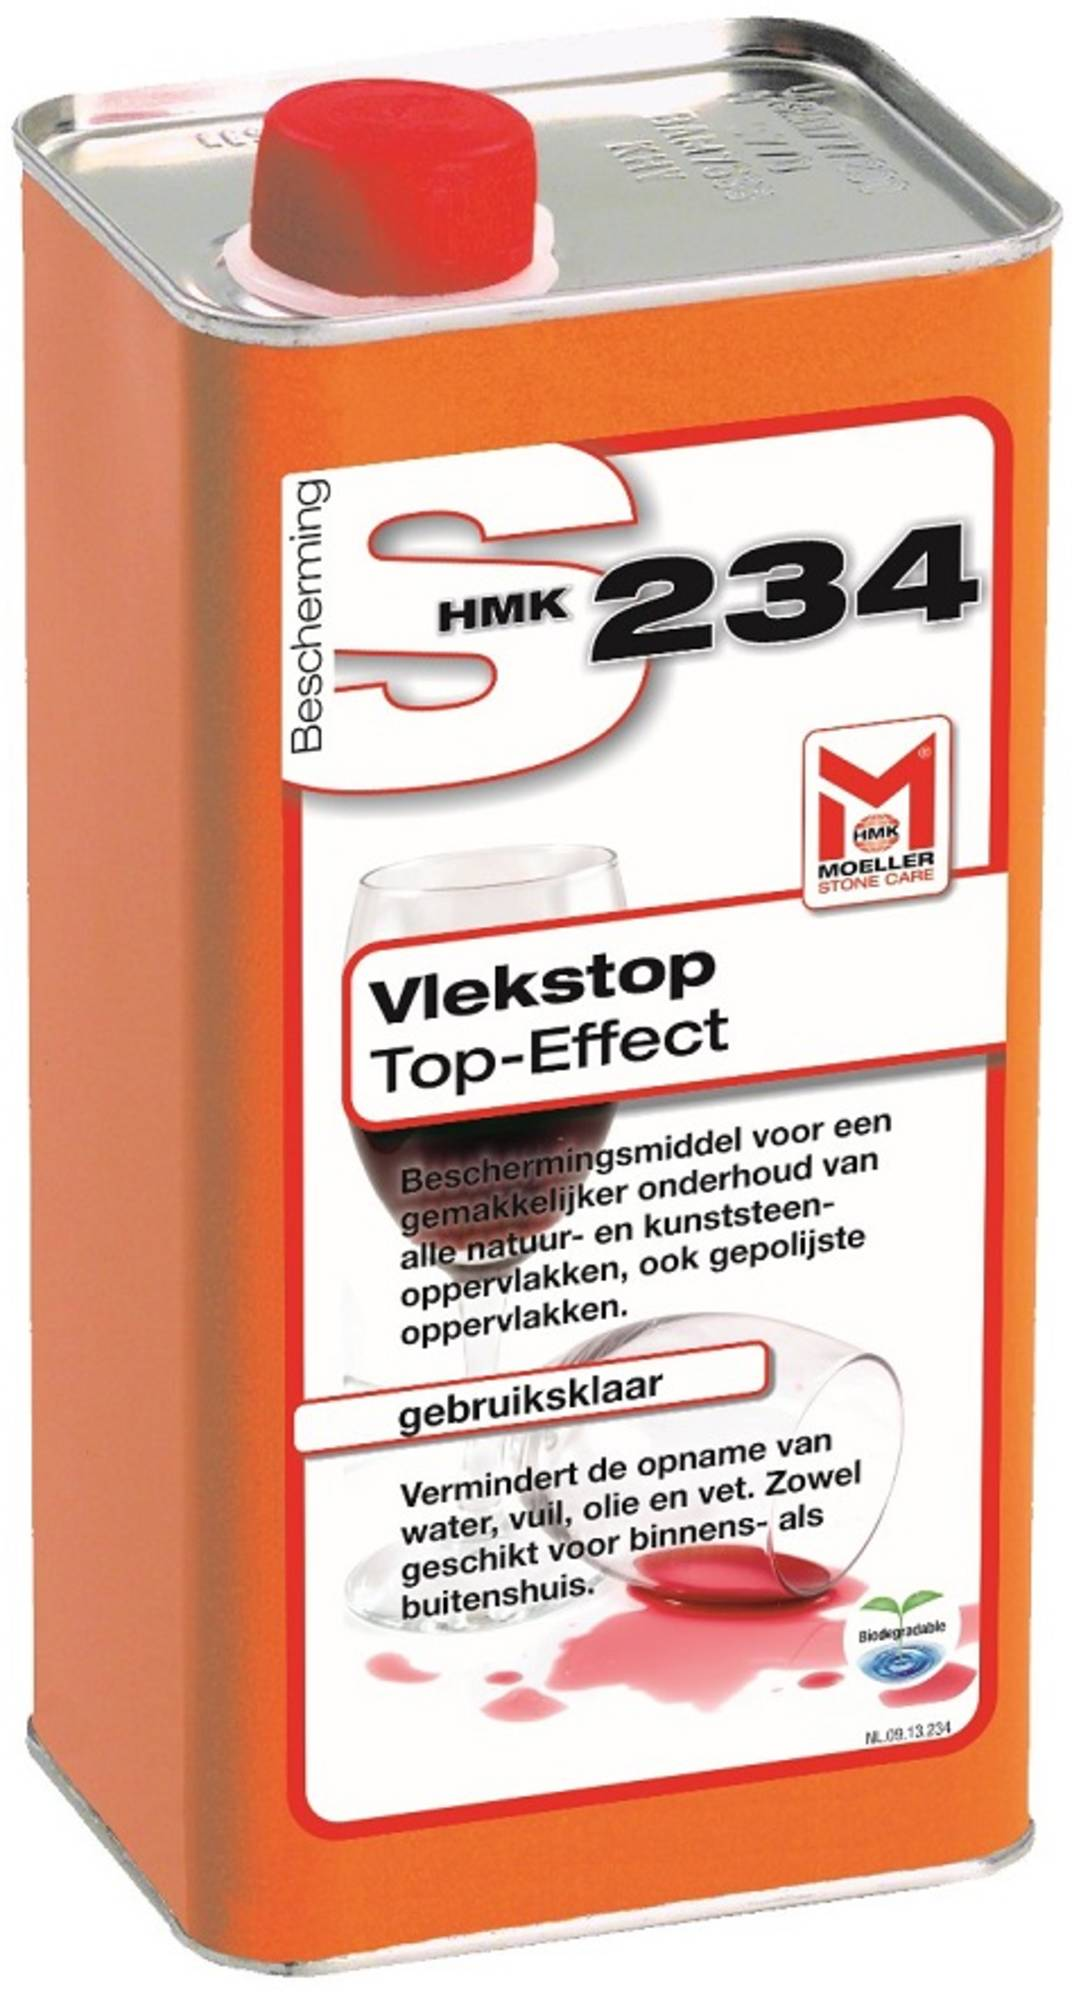 HMK S234 Vlekstop-Top Effect